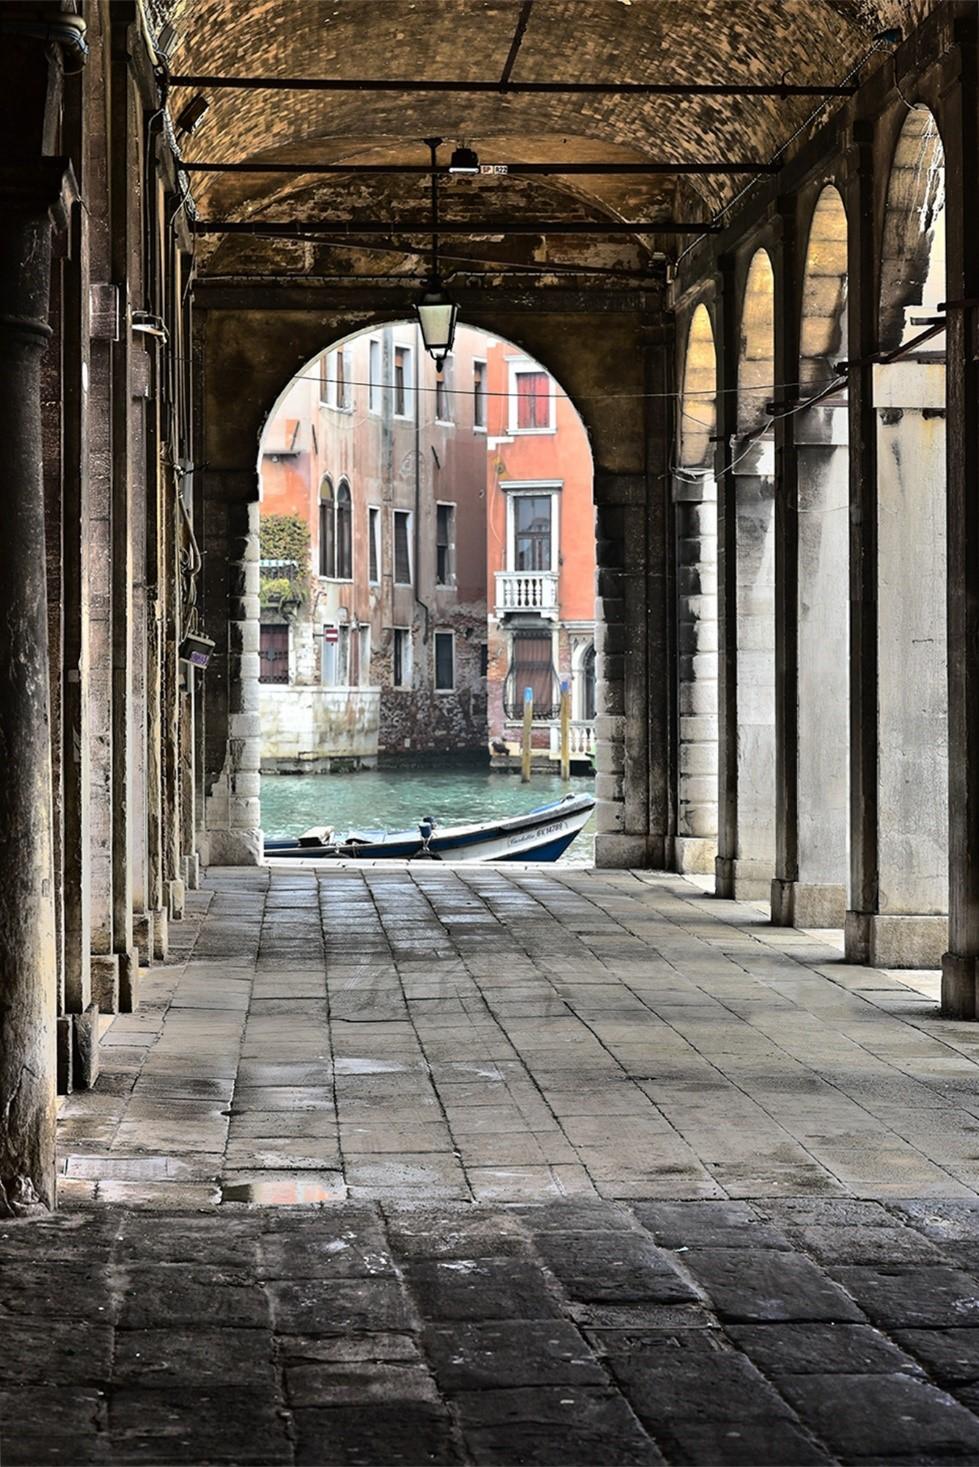 Venise arcade